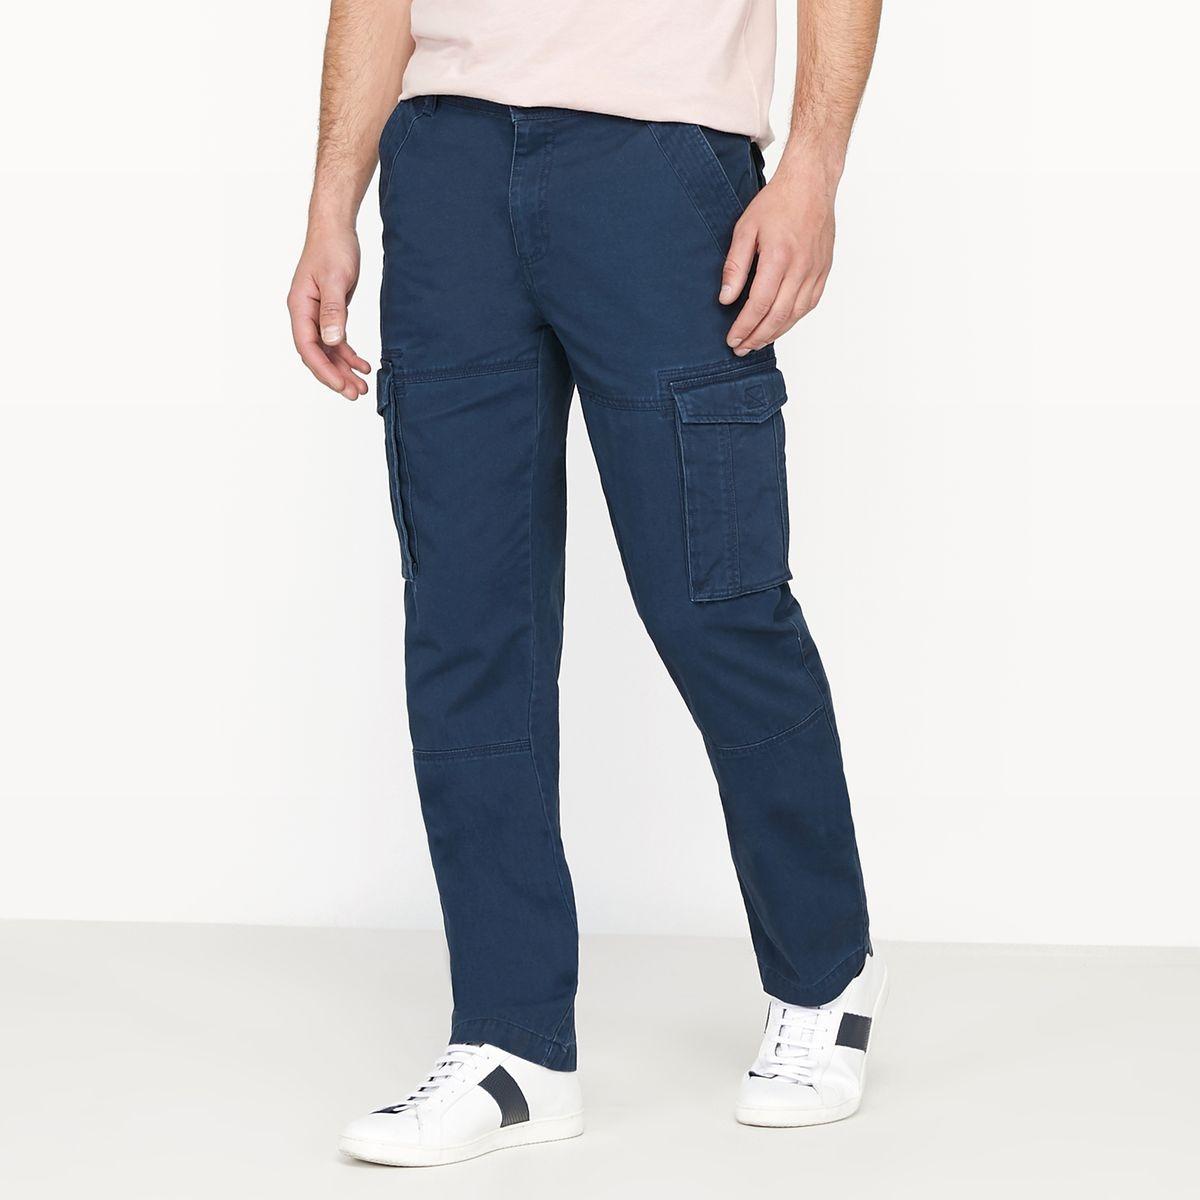 Pantalon cargo regular pur coton